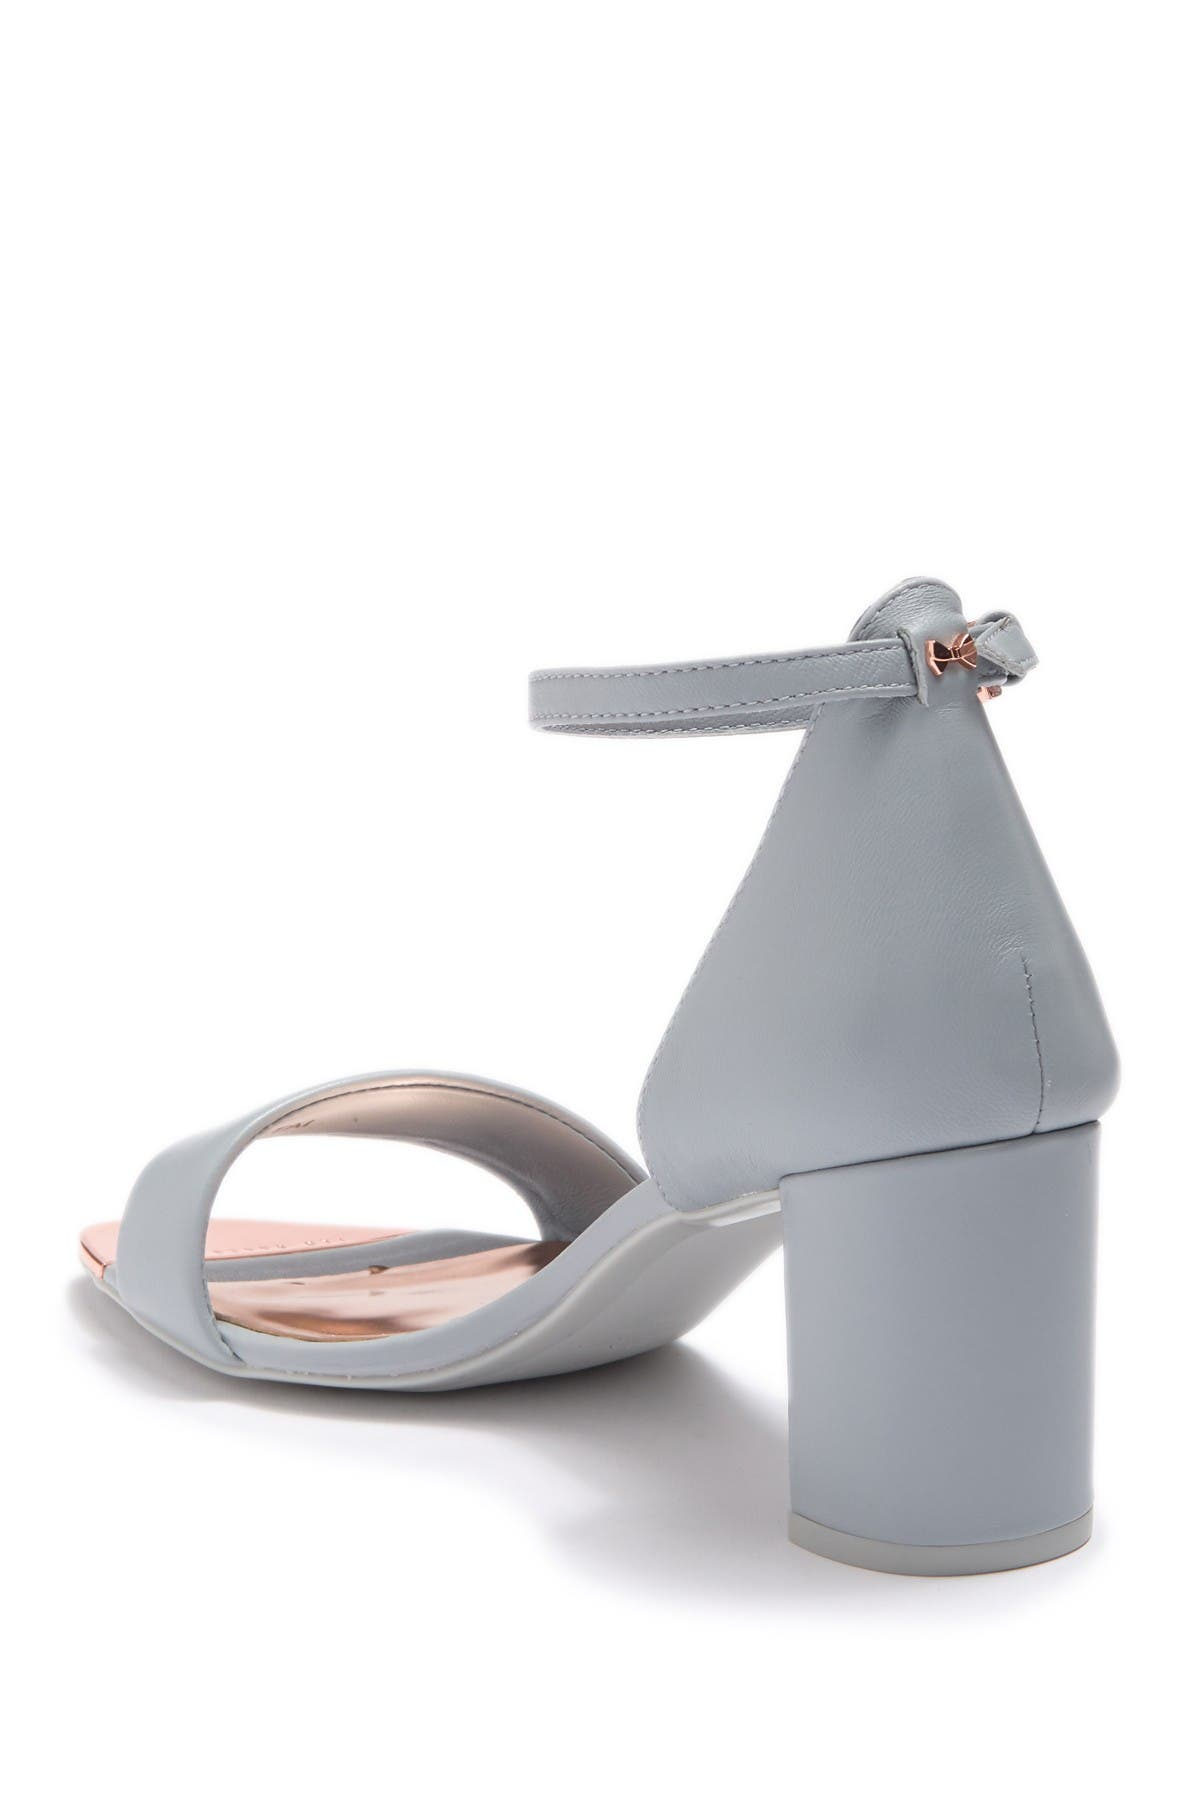 Image of Ted Baker London Sheah Leather Block Heel Sandal